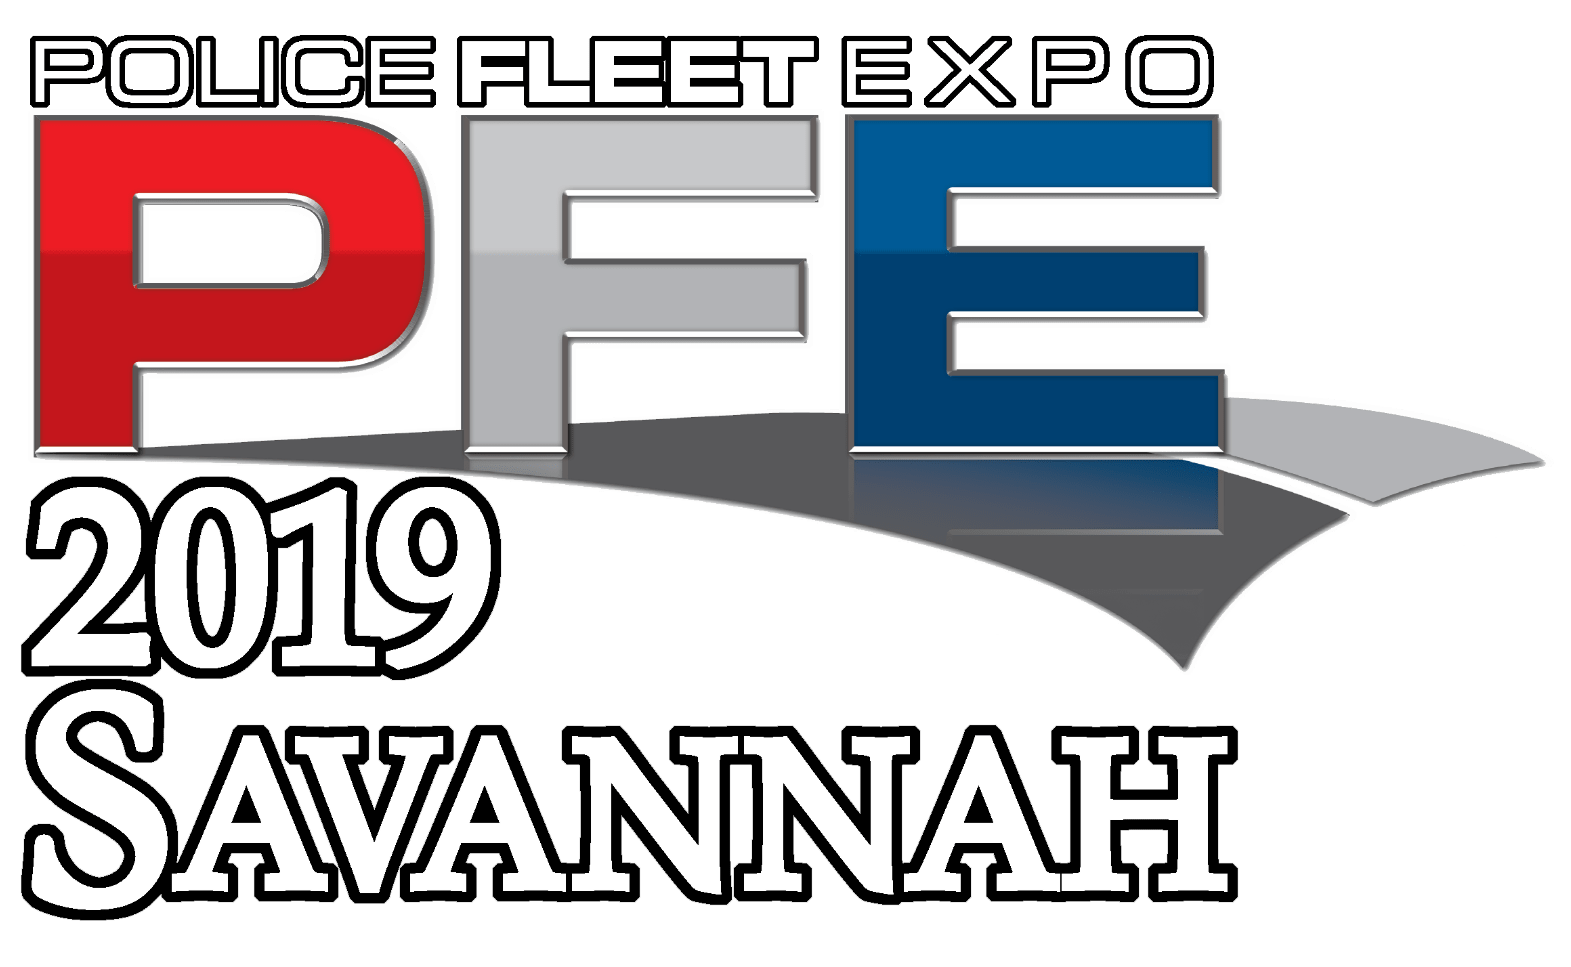 Police Fleet Expo Savannah 2019